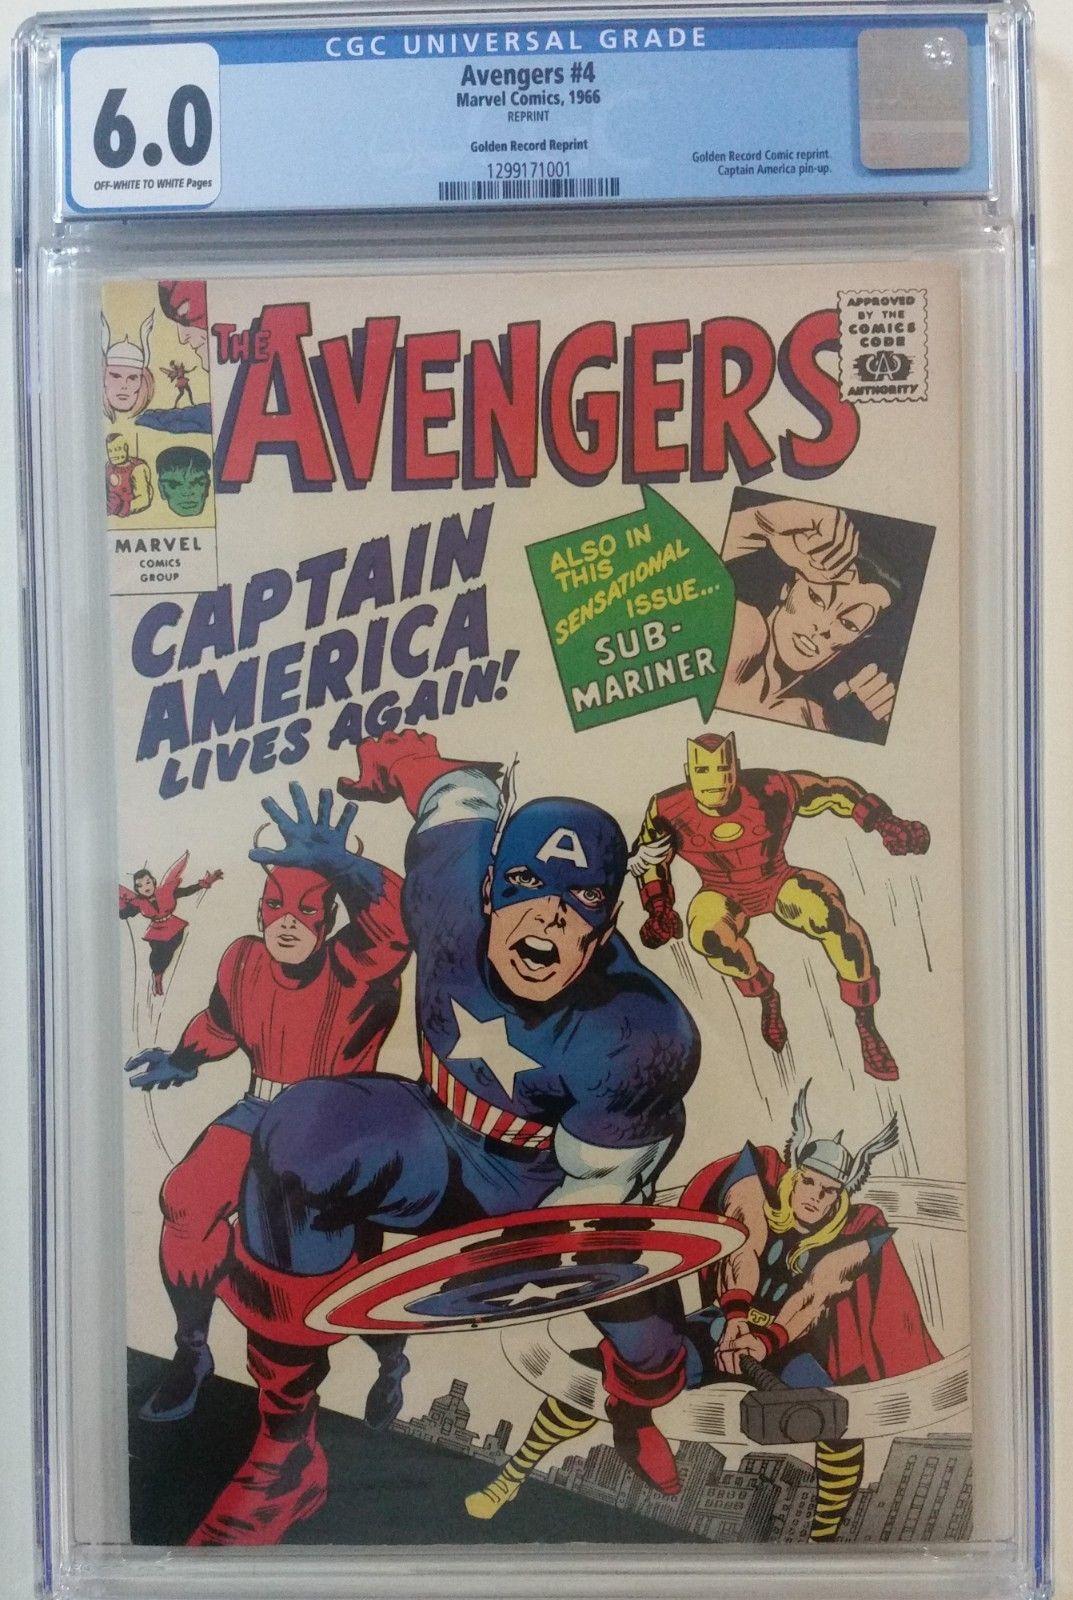 Avengers #4 CGC 6.0 (Golden R. Reprint) 1966. 1st silver age Captain America